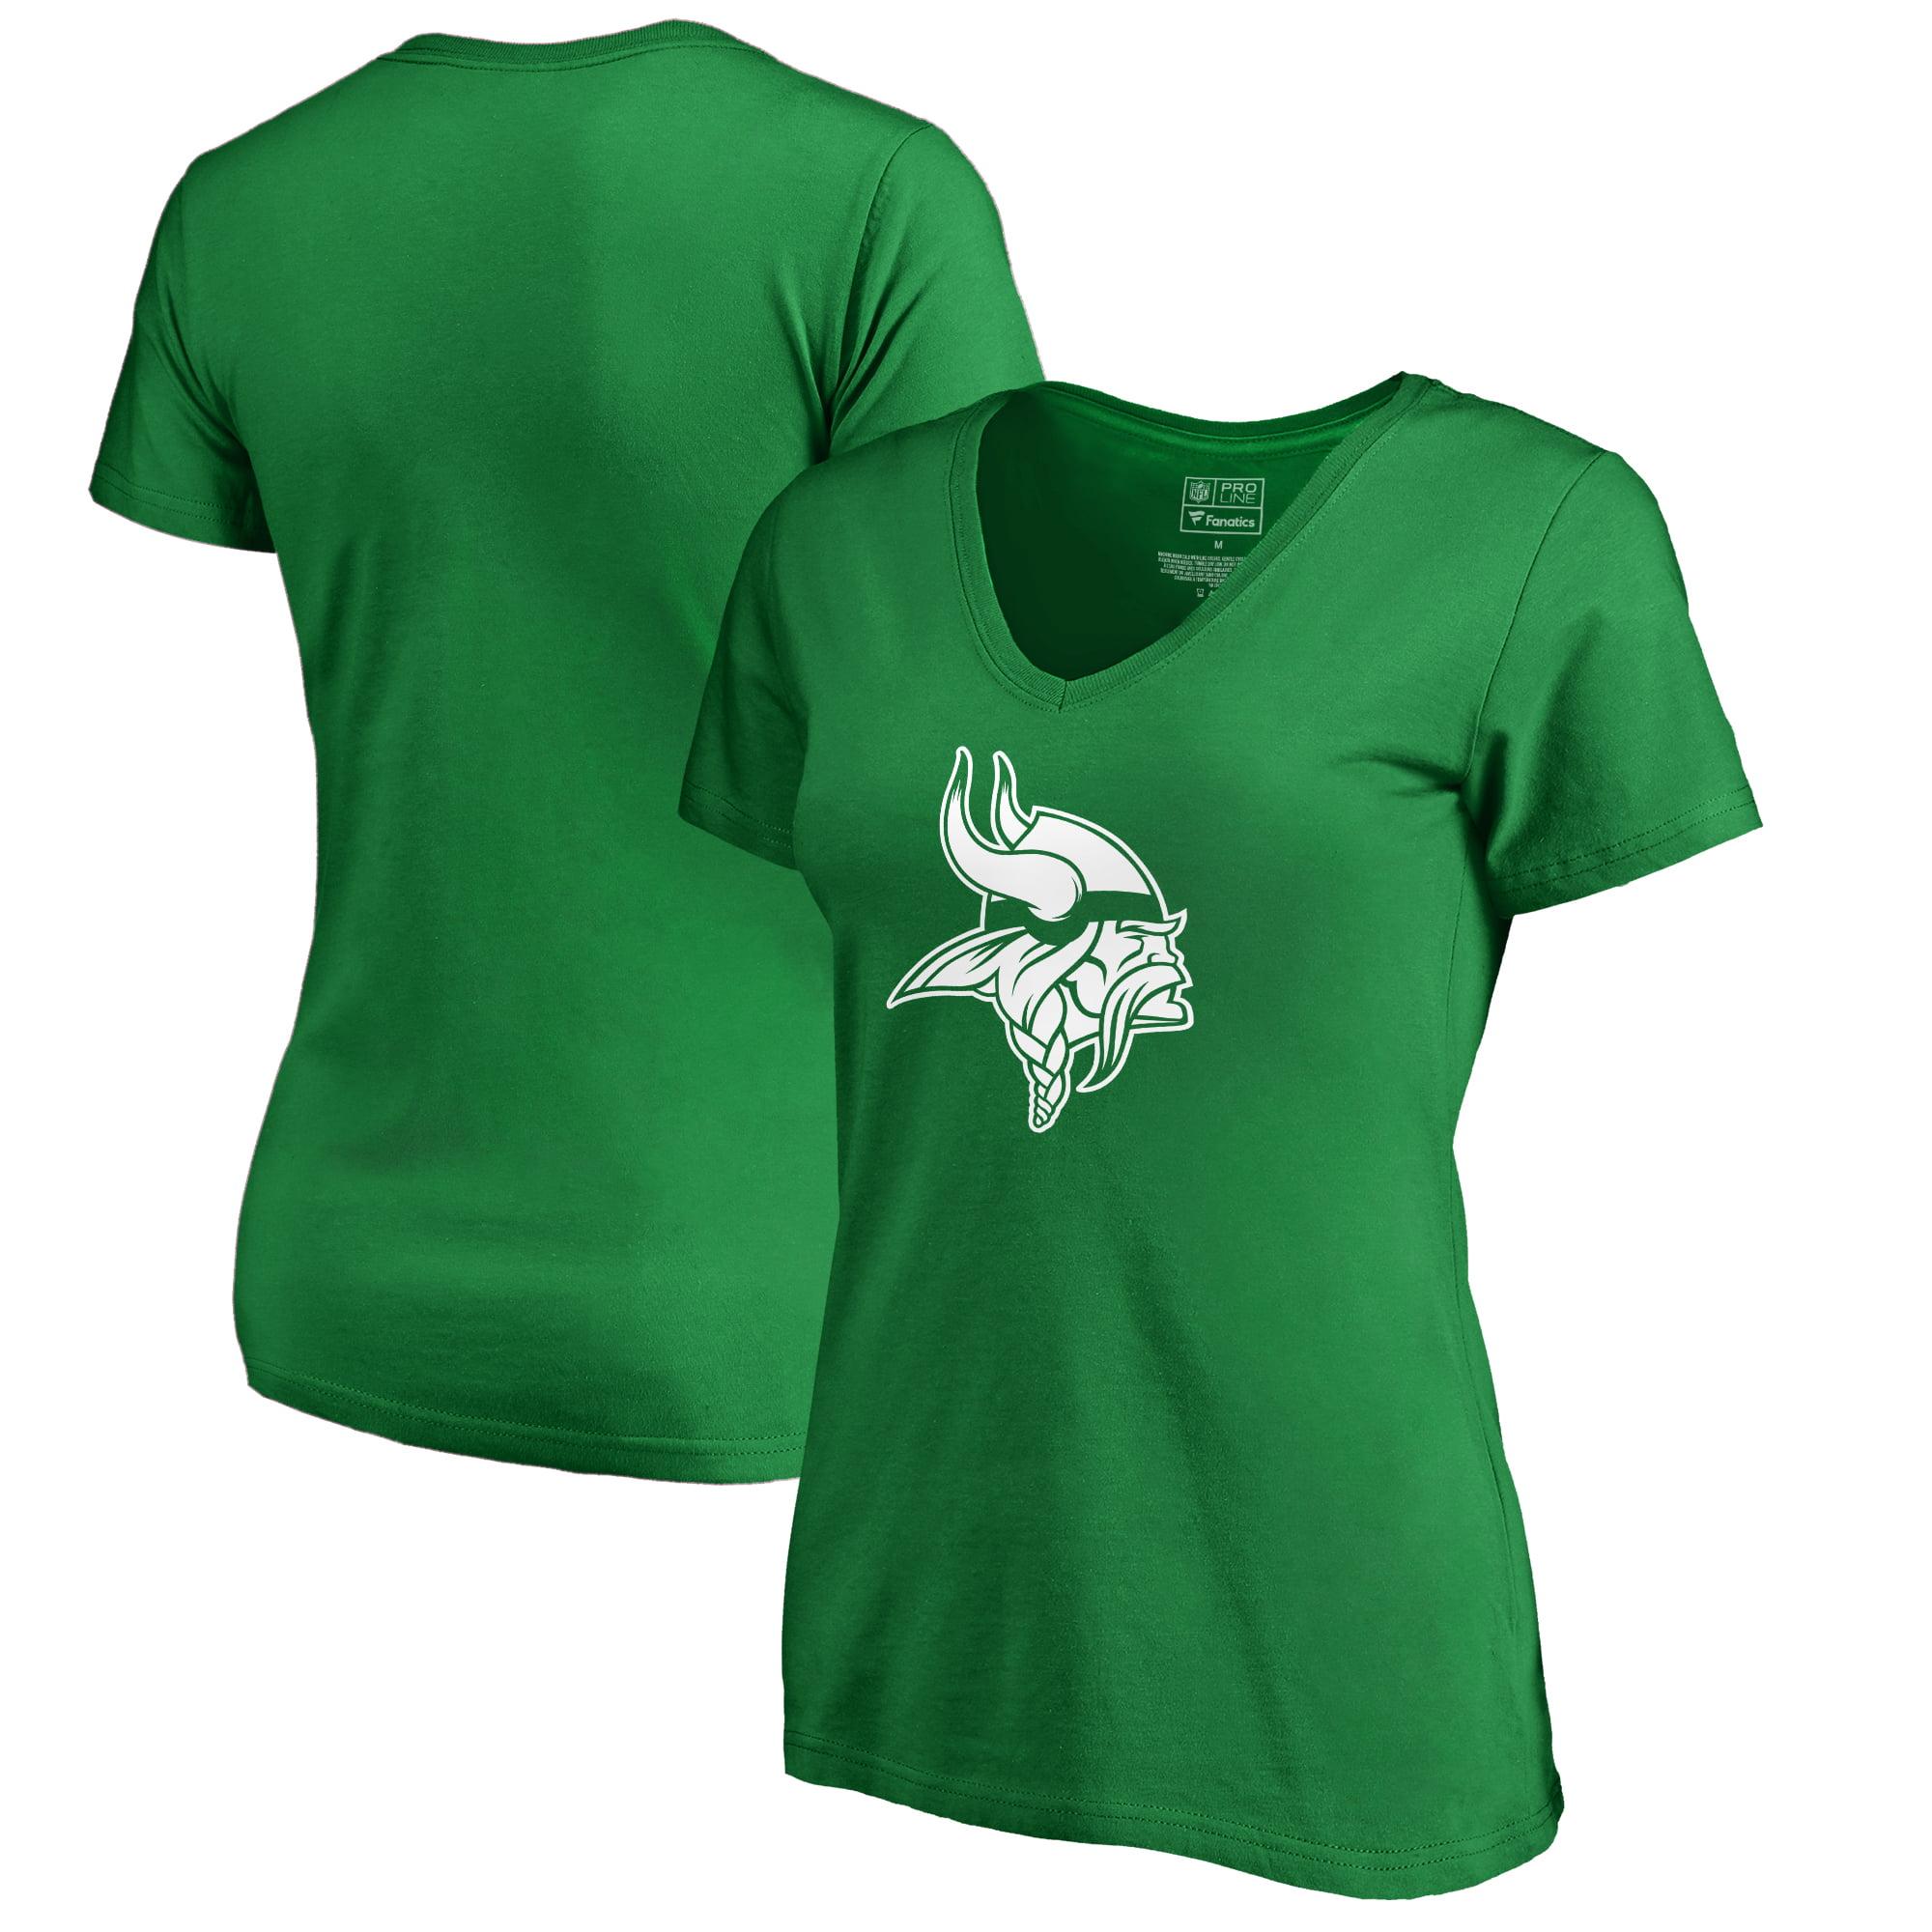 Minnesota Vikings NFL Pro Line by Fanatics Branded Women's St. Patrick's Day White Logo T-Shirt - Kelly Green